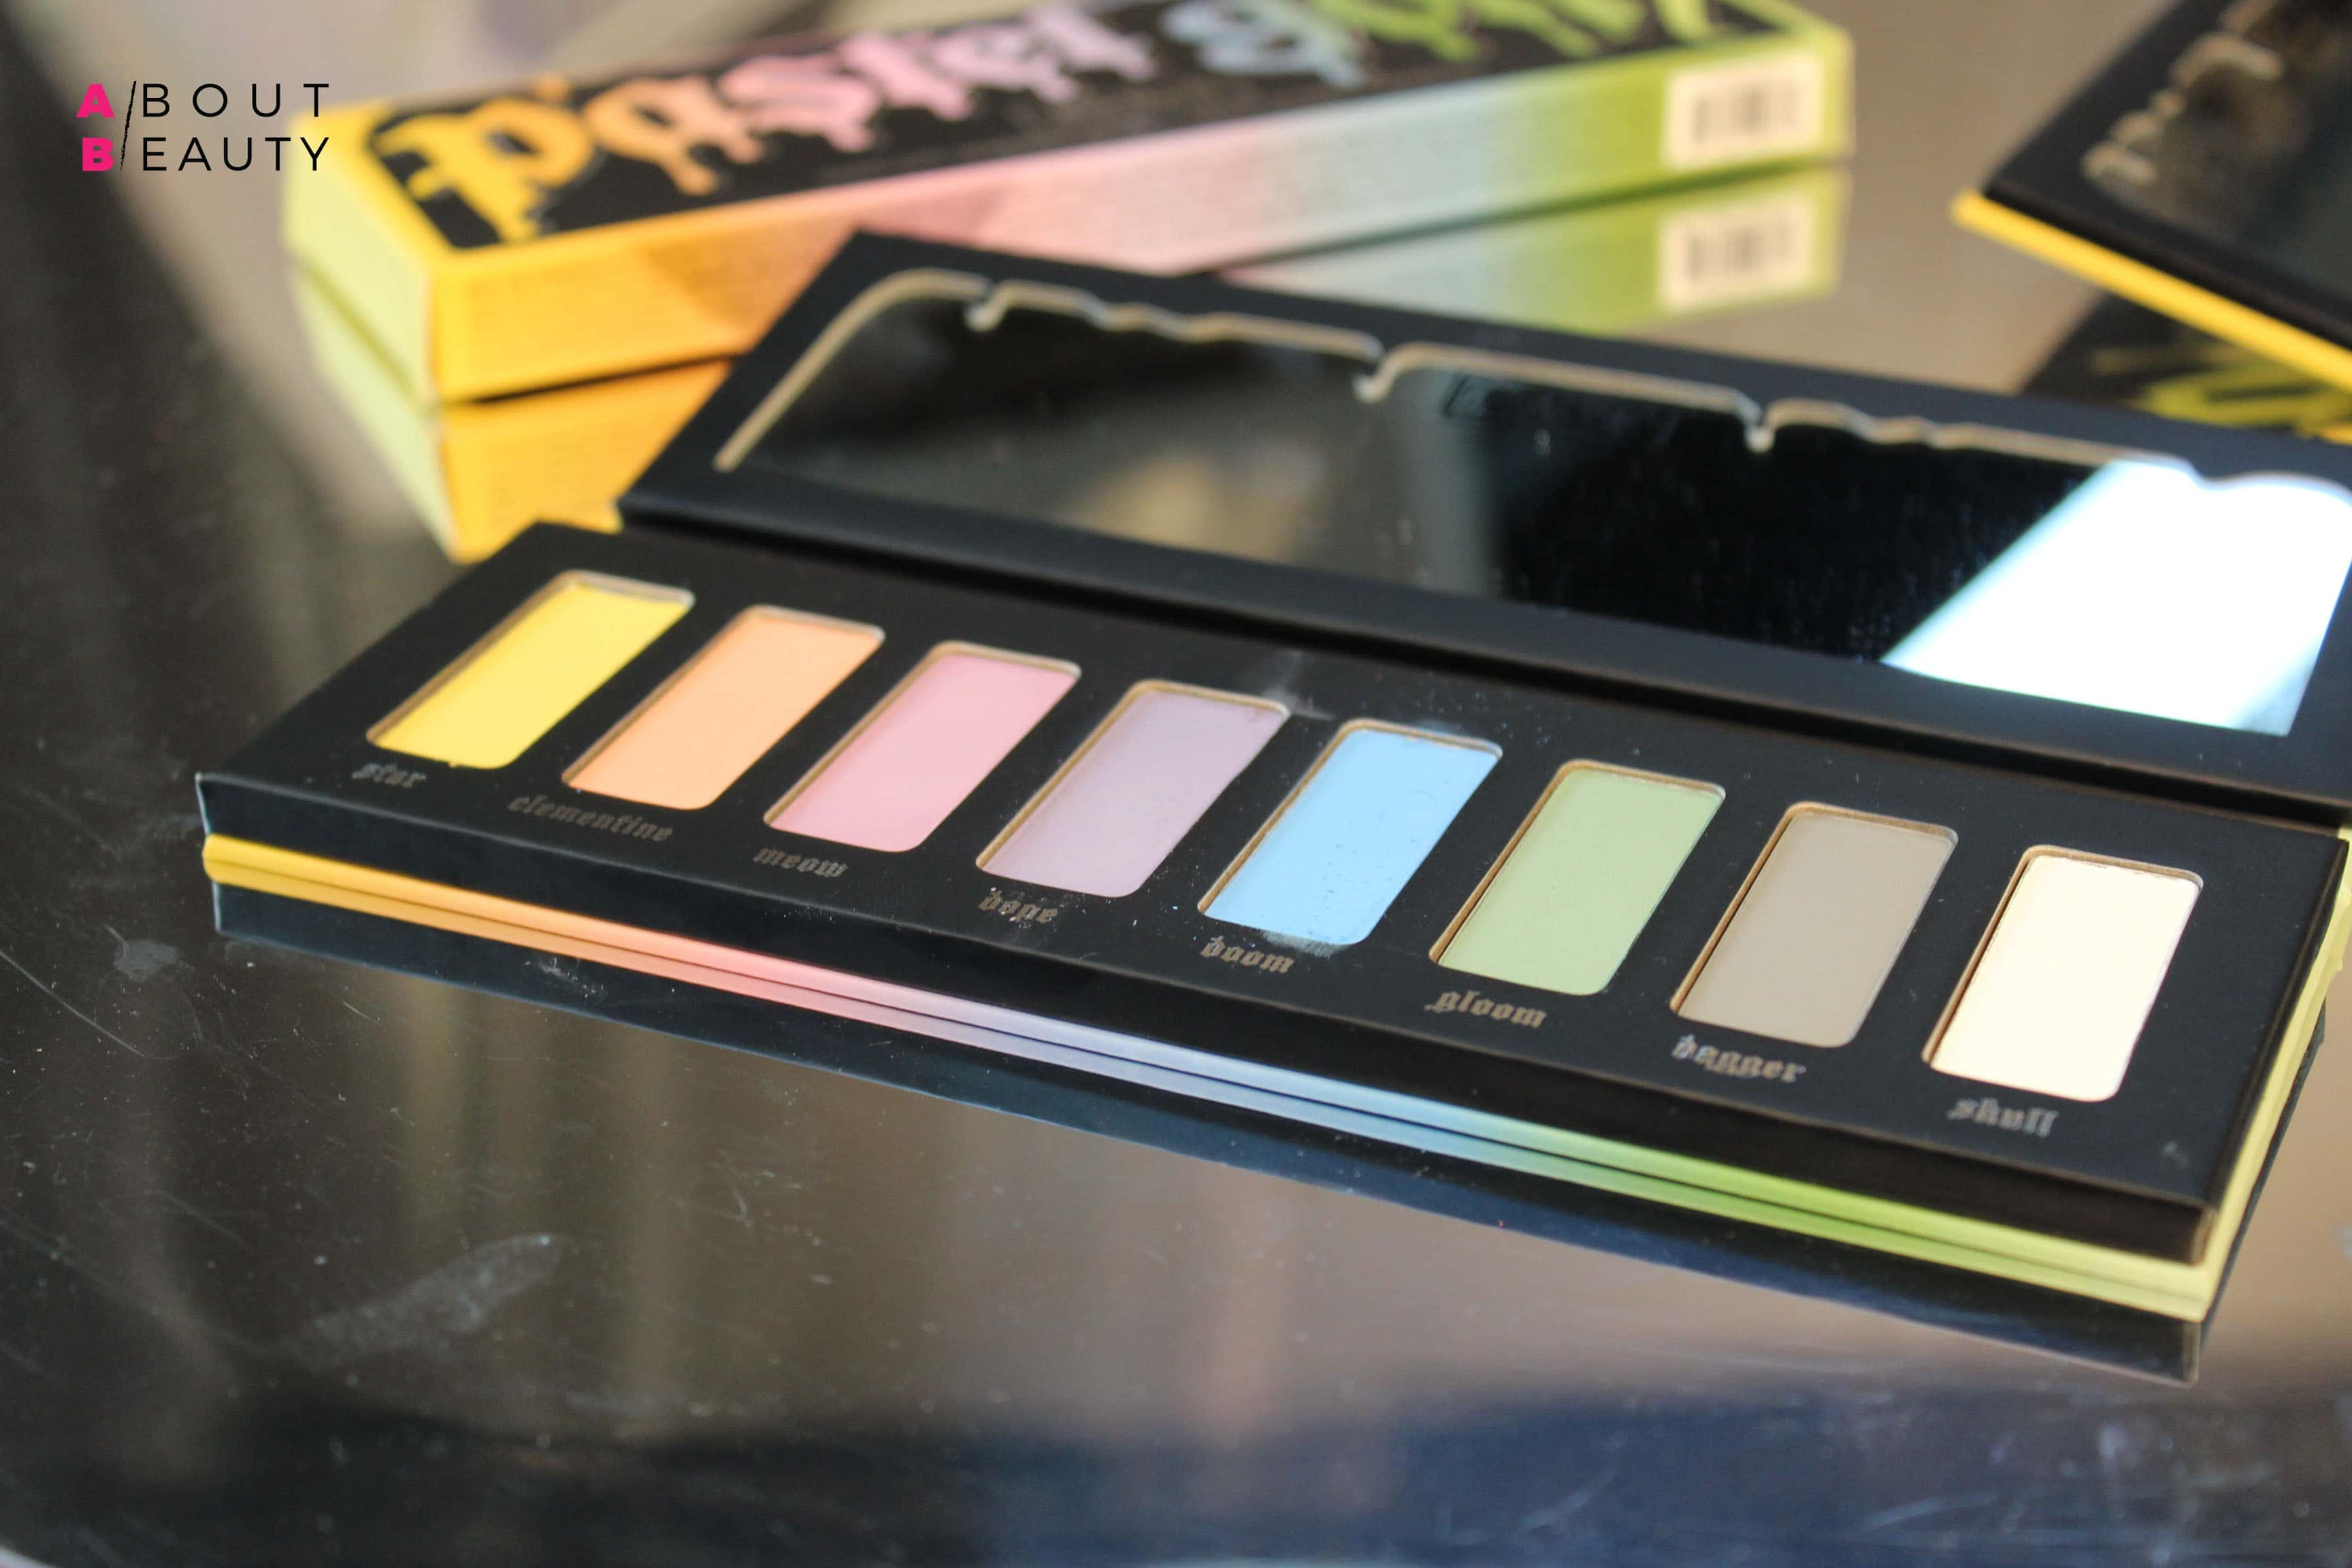 Kat Von D, tutti i prodotti per il trucco occhi in arrivo da Sephora - Pastel Goth Eyeshadow Palette